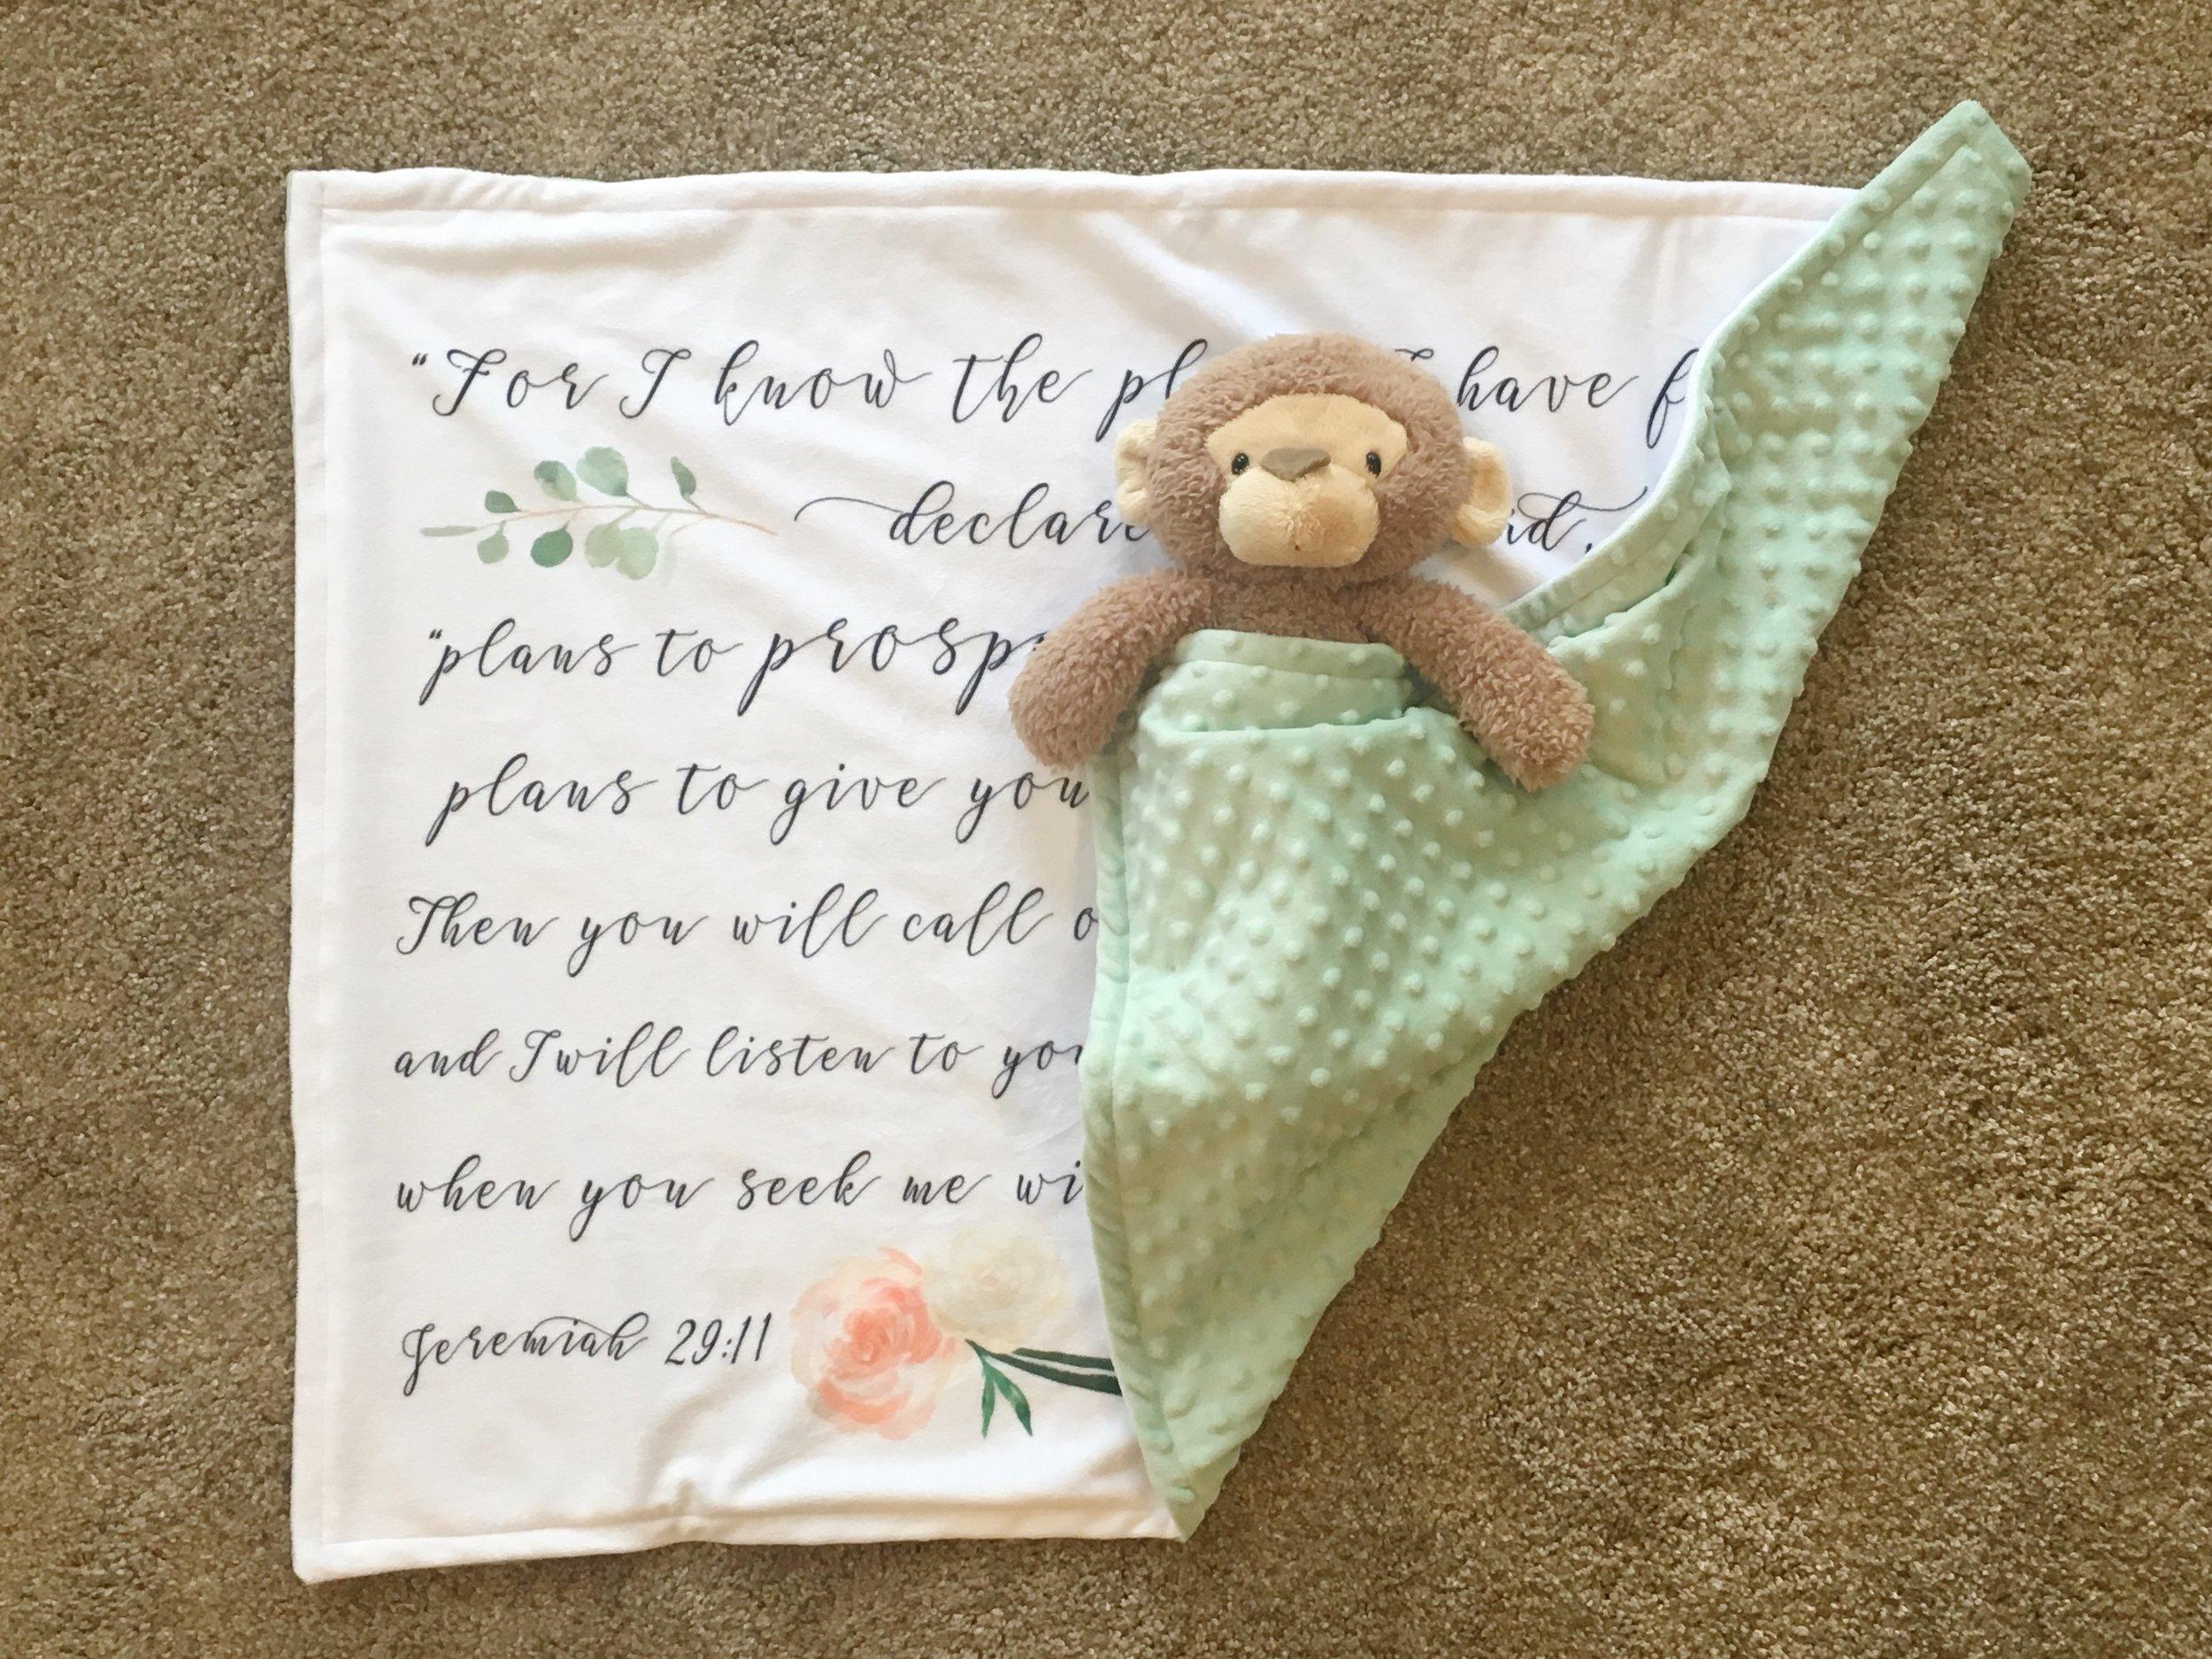 Central PA, Baby Blanket, Hand lettered, JesSmith Designs, Invitations, custom-04-22 09.59.40.jpg